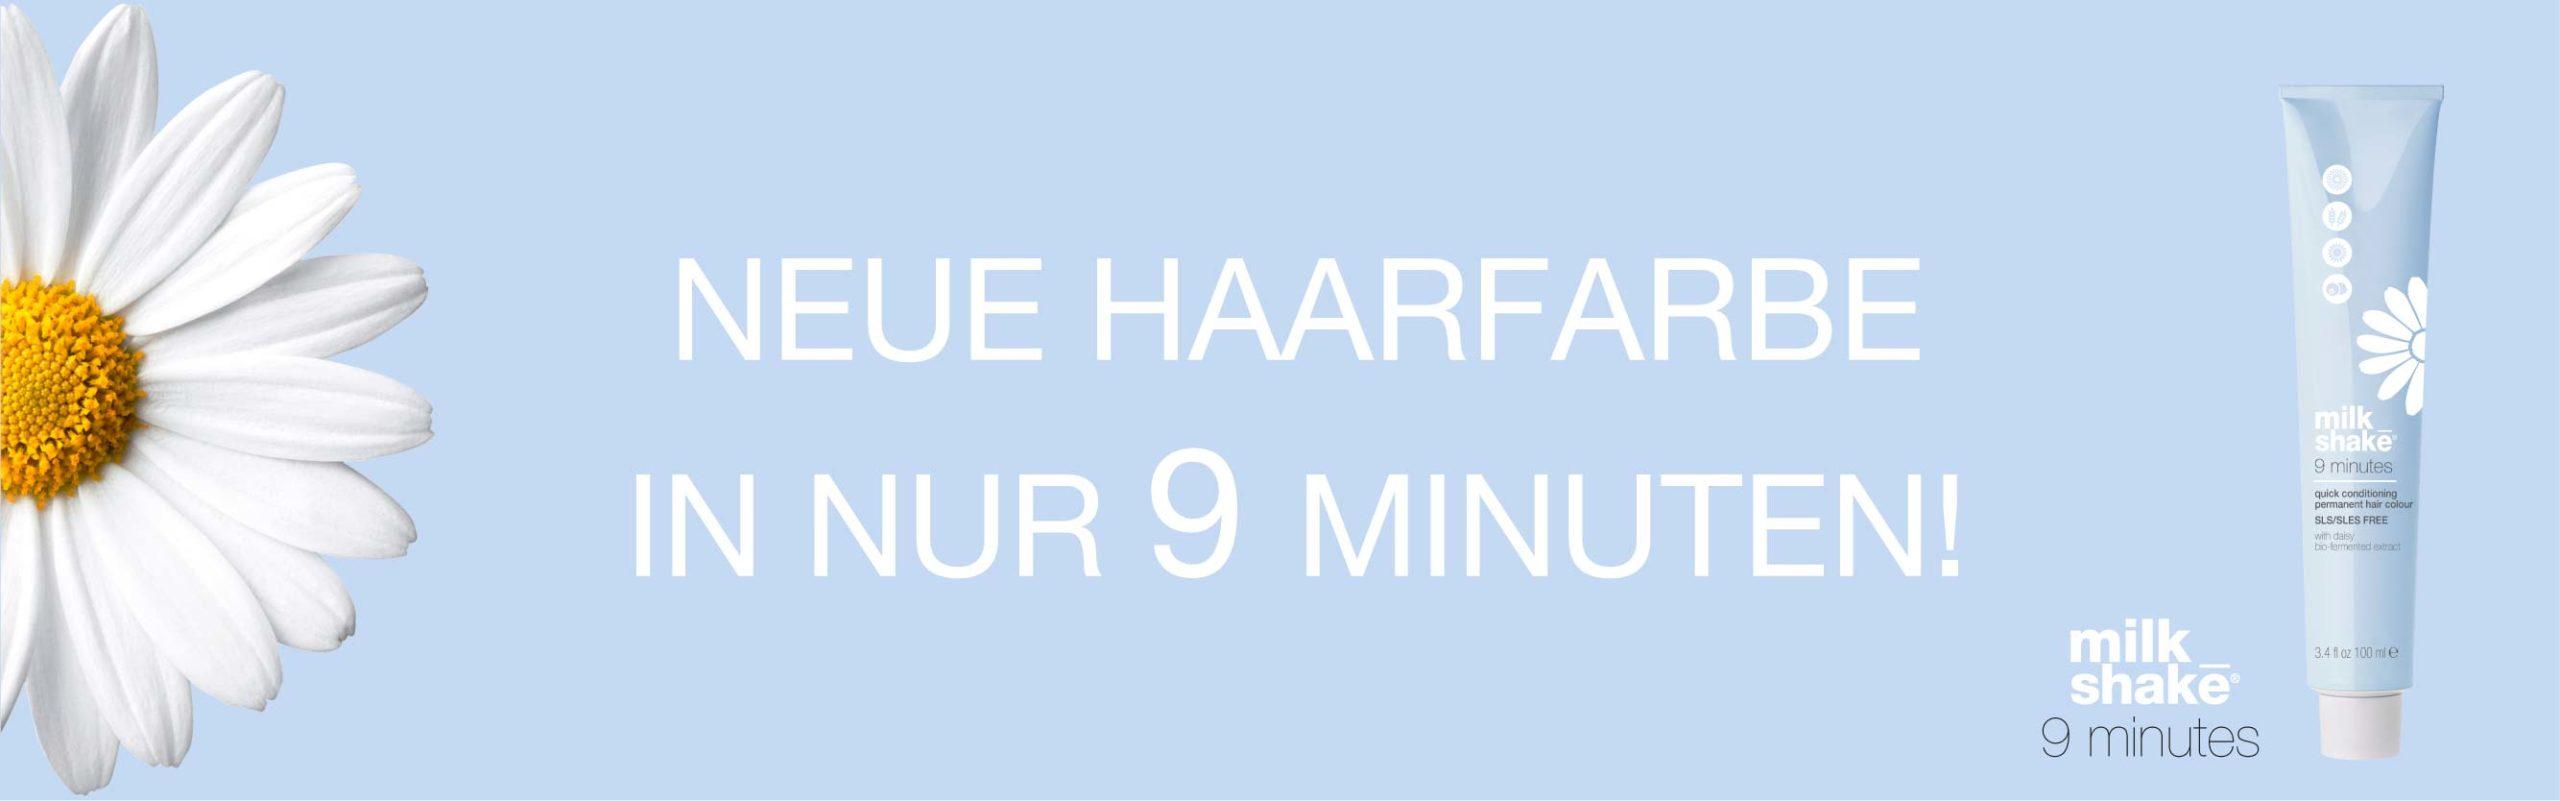 milk_shake 9 Minutes Haarfarbe